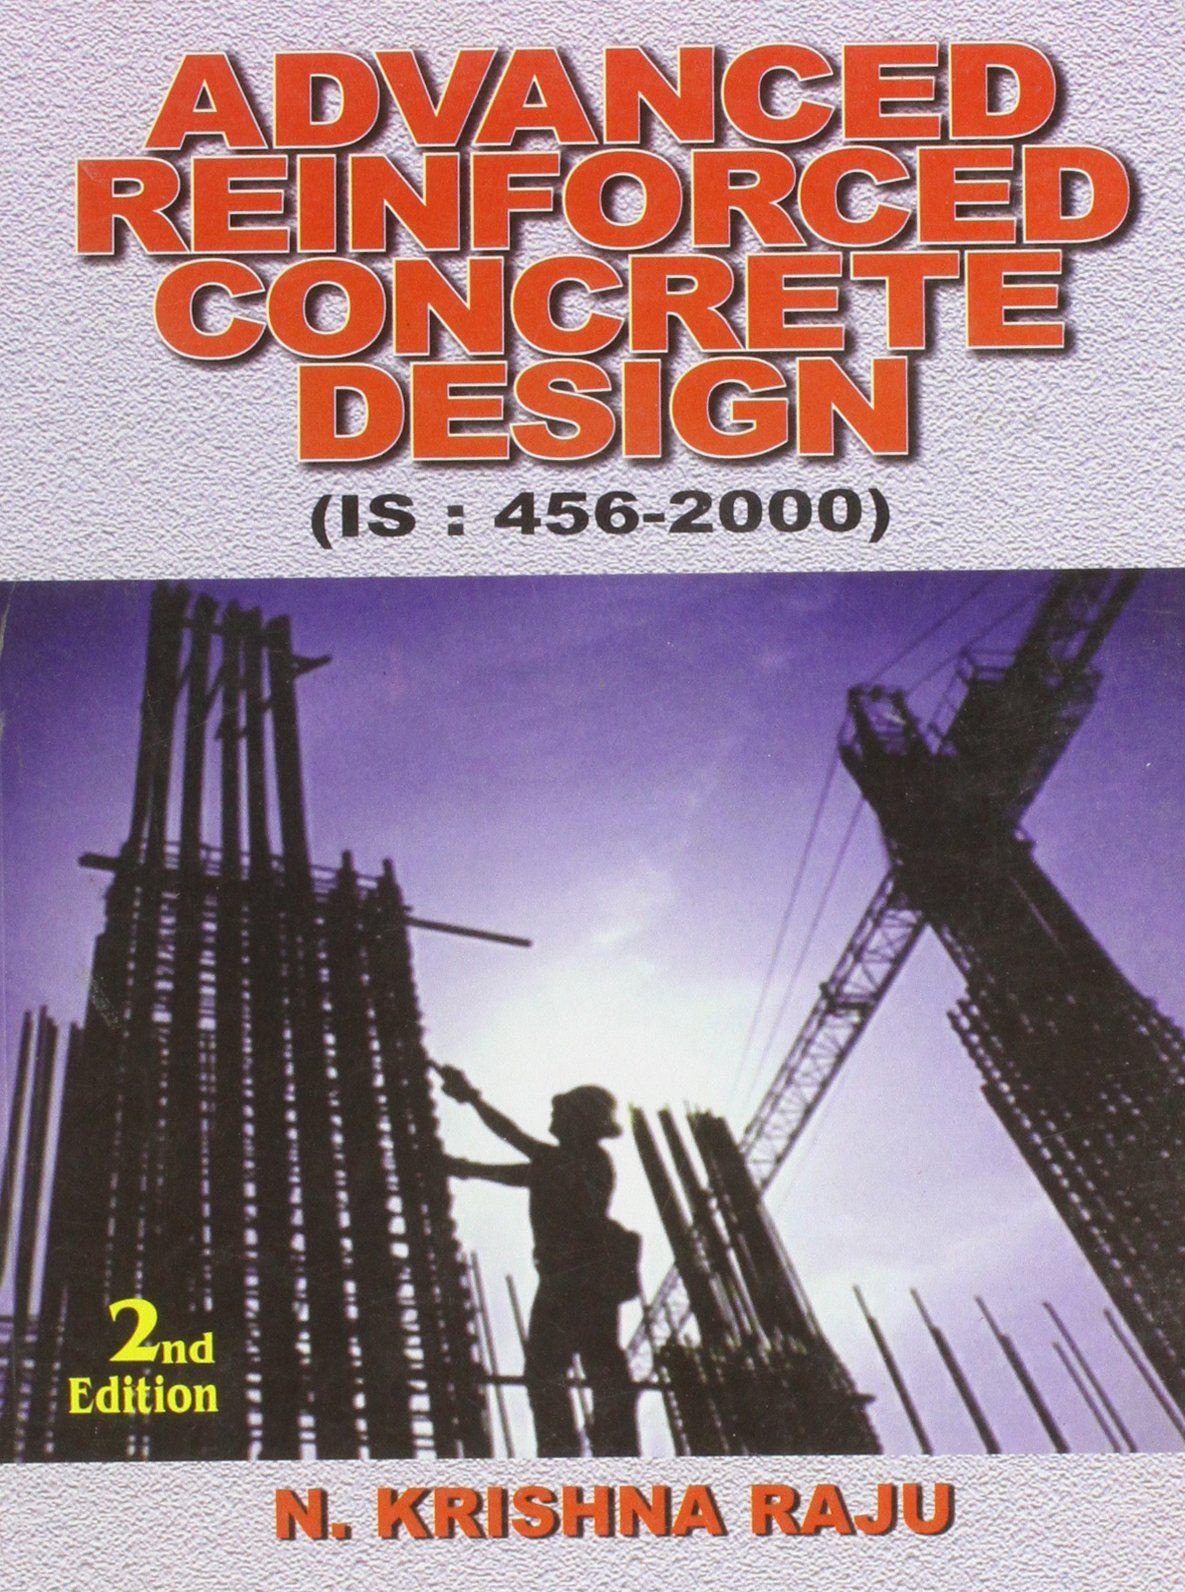 Advanced Reinforced Concrete Design (IS: 456-2000) By Krishna N. Raju